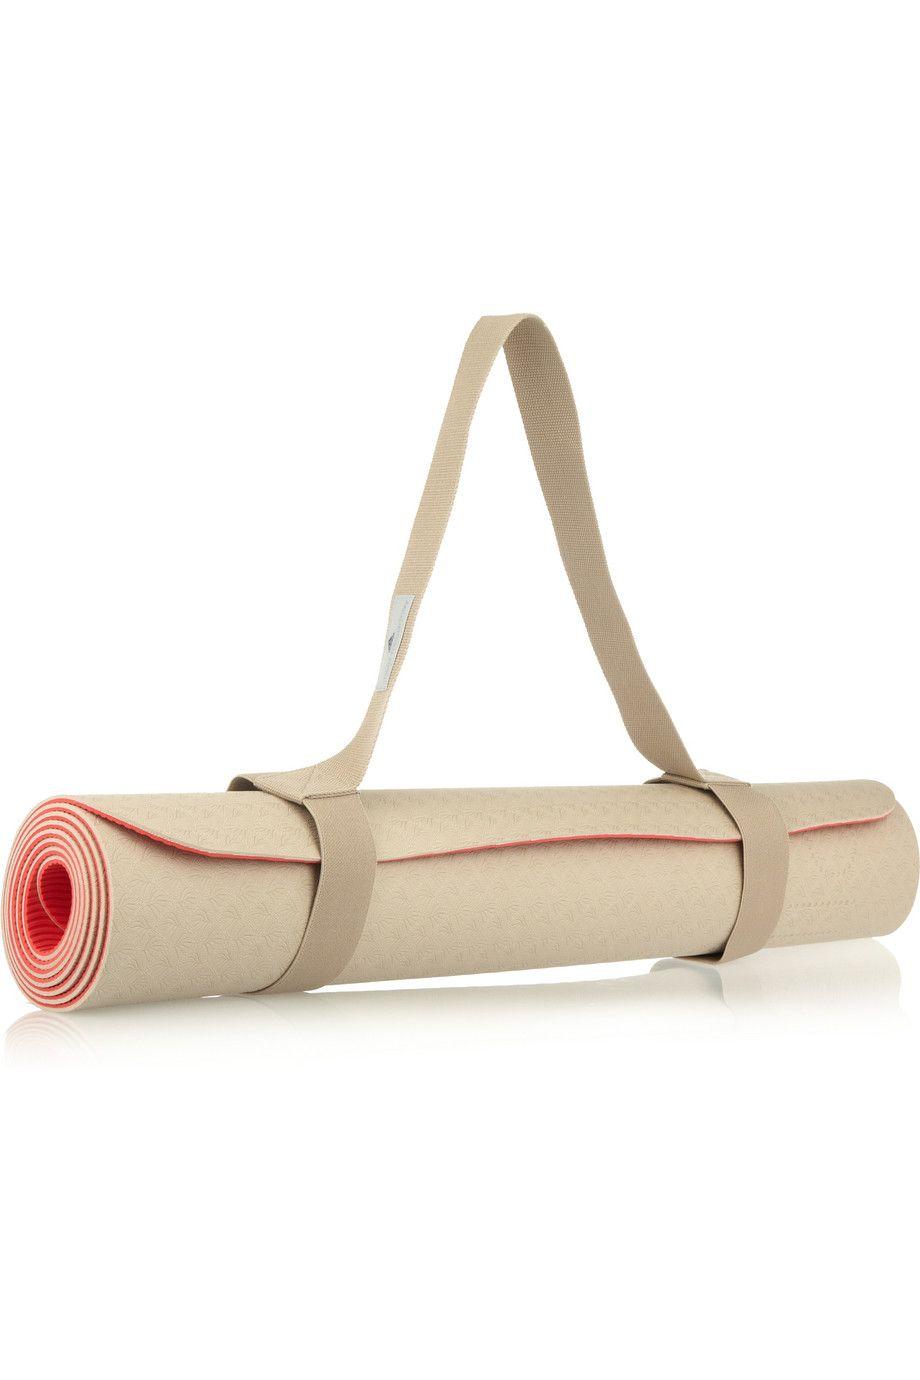 adidas by stella mccartney yoga mat. coral + nude 5c6388d29e39f